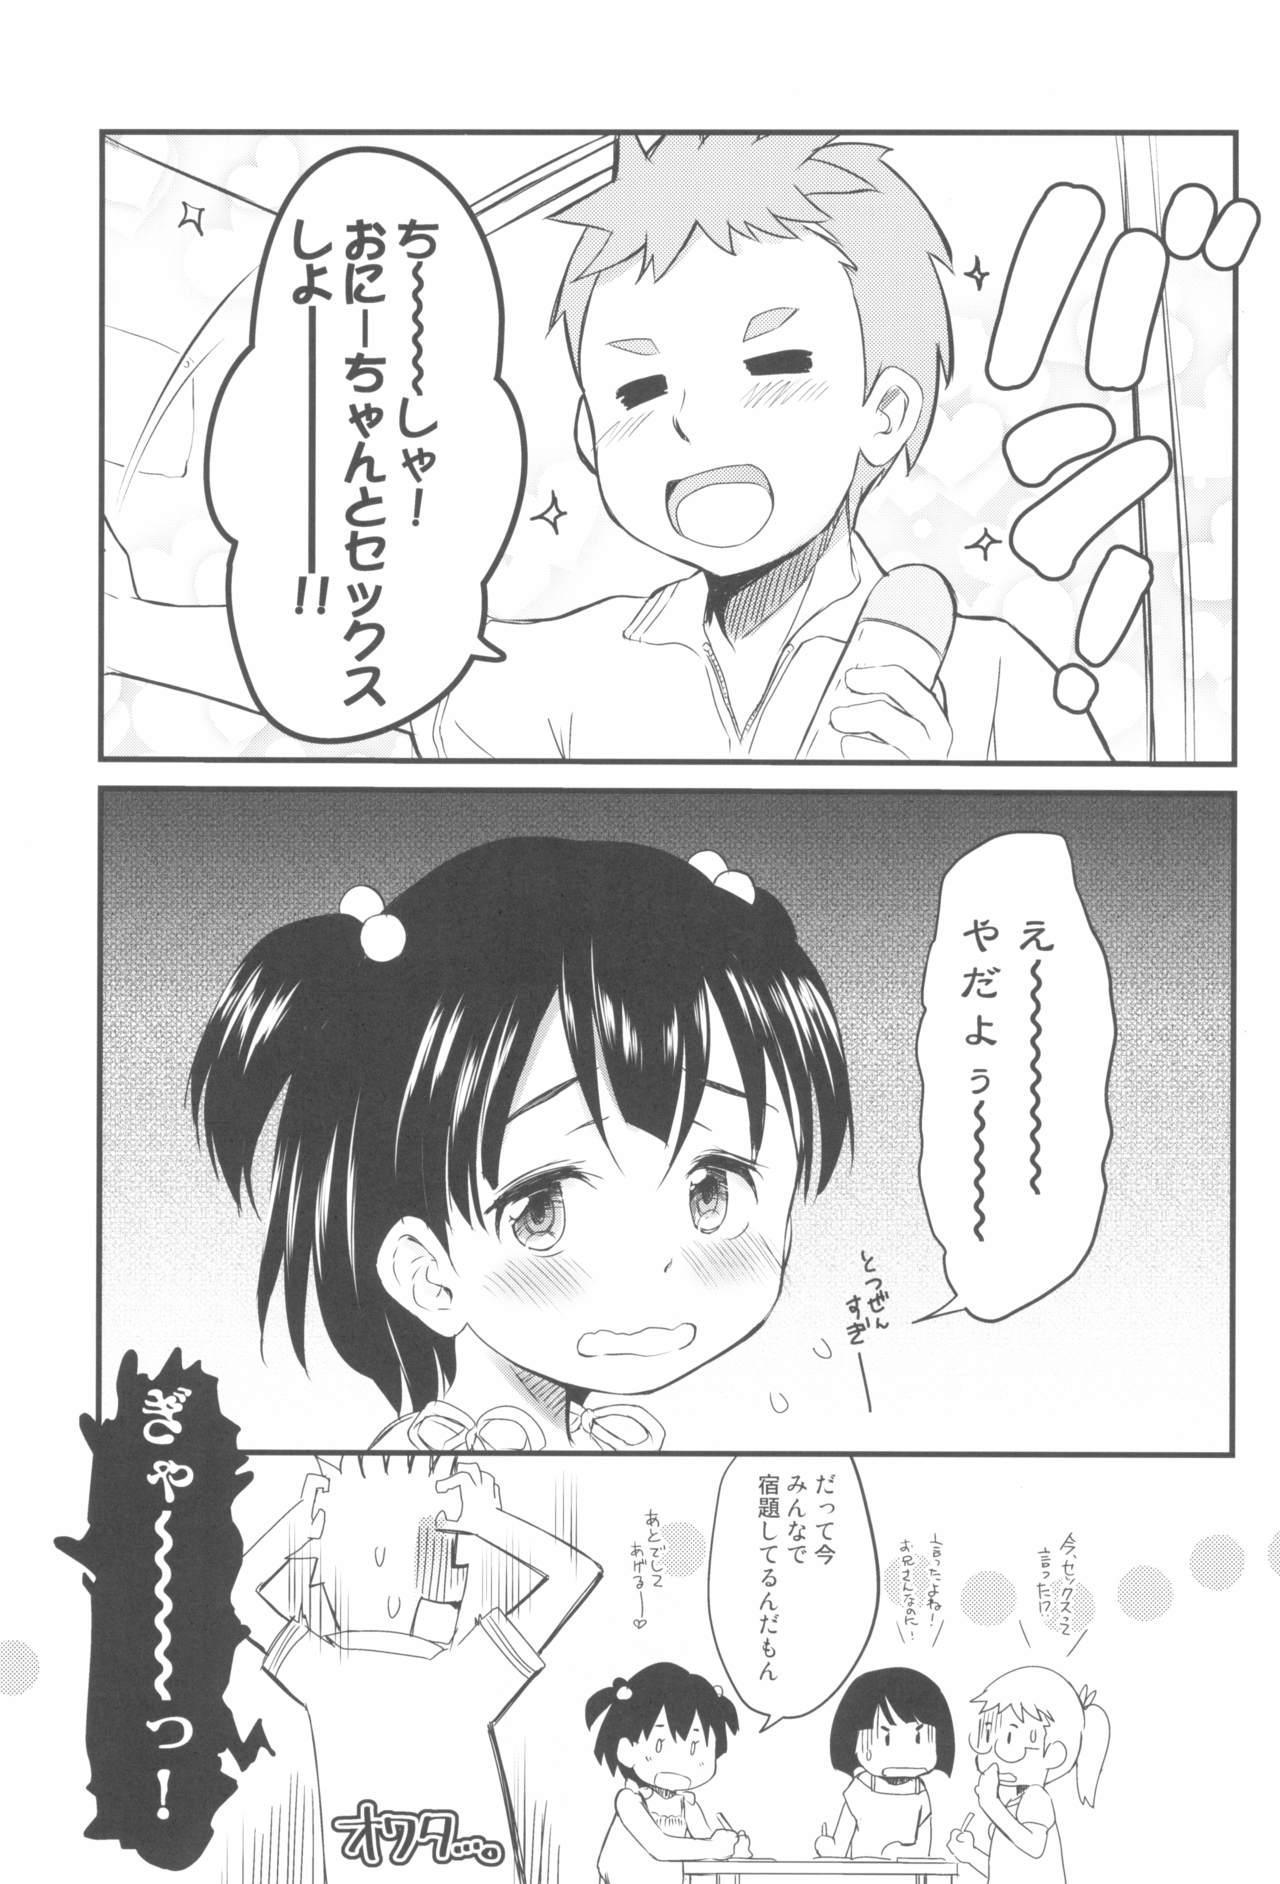 (C97) [Wancho-ke (Wancho)] Imouto wa Minna Onii-chan ga Suki! 5-Kaiteiban- 28